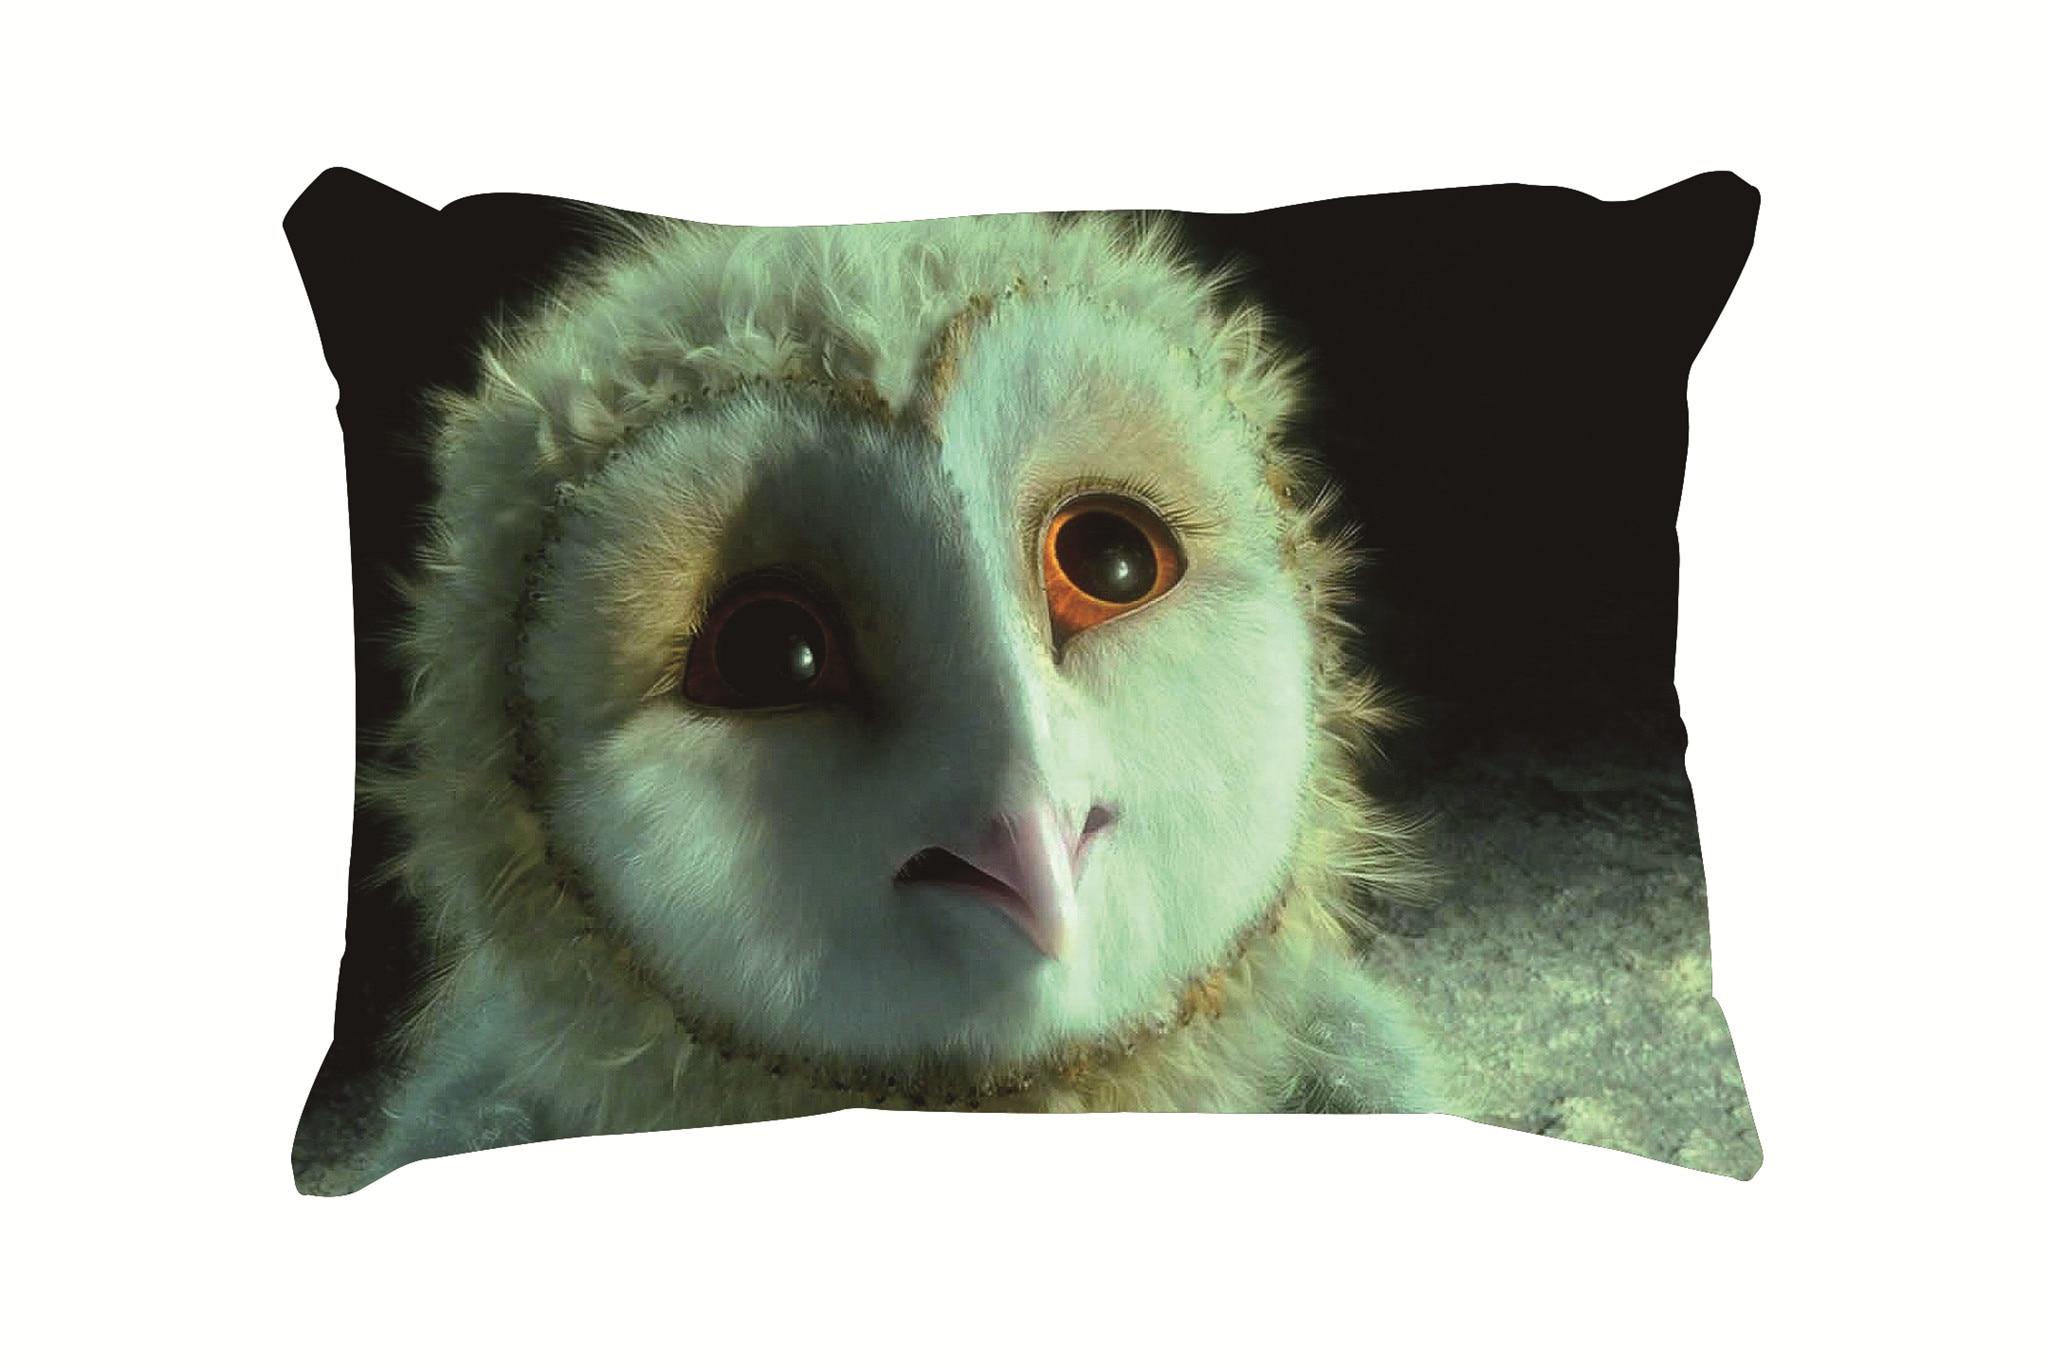 Cute Owl Baby Customized Cotton Linen Rectangle Throw Pillow Case Decorative Cushion Cover Pillowcase 20*30 Inch(50*76cm)